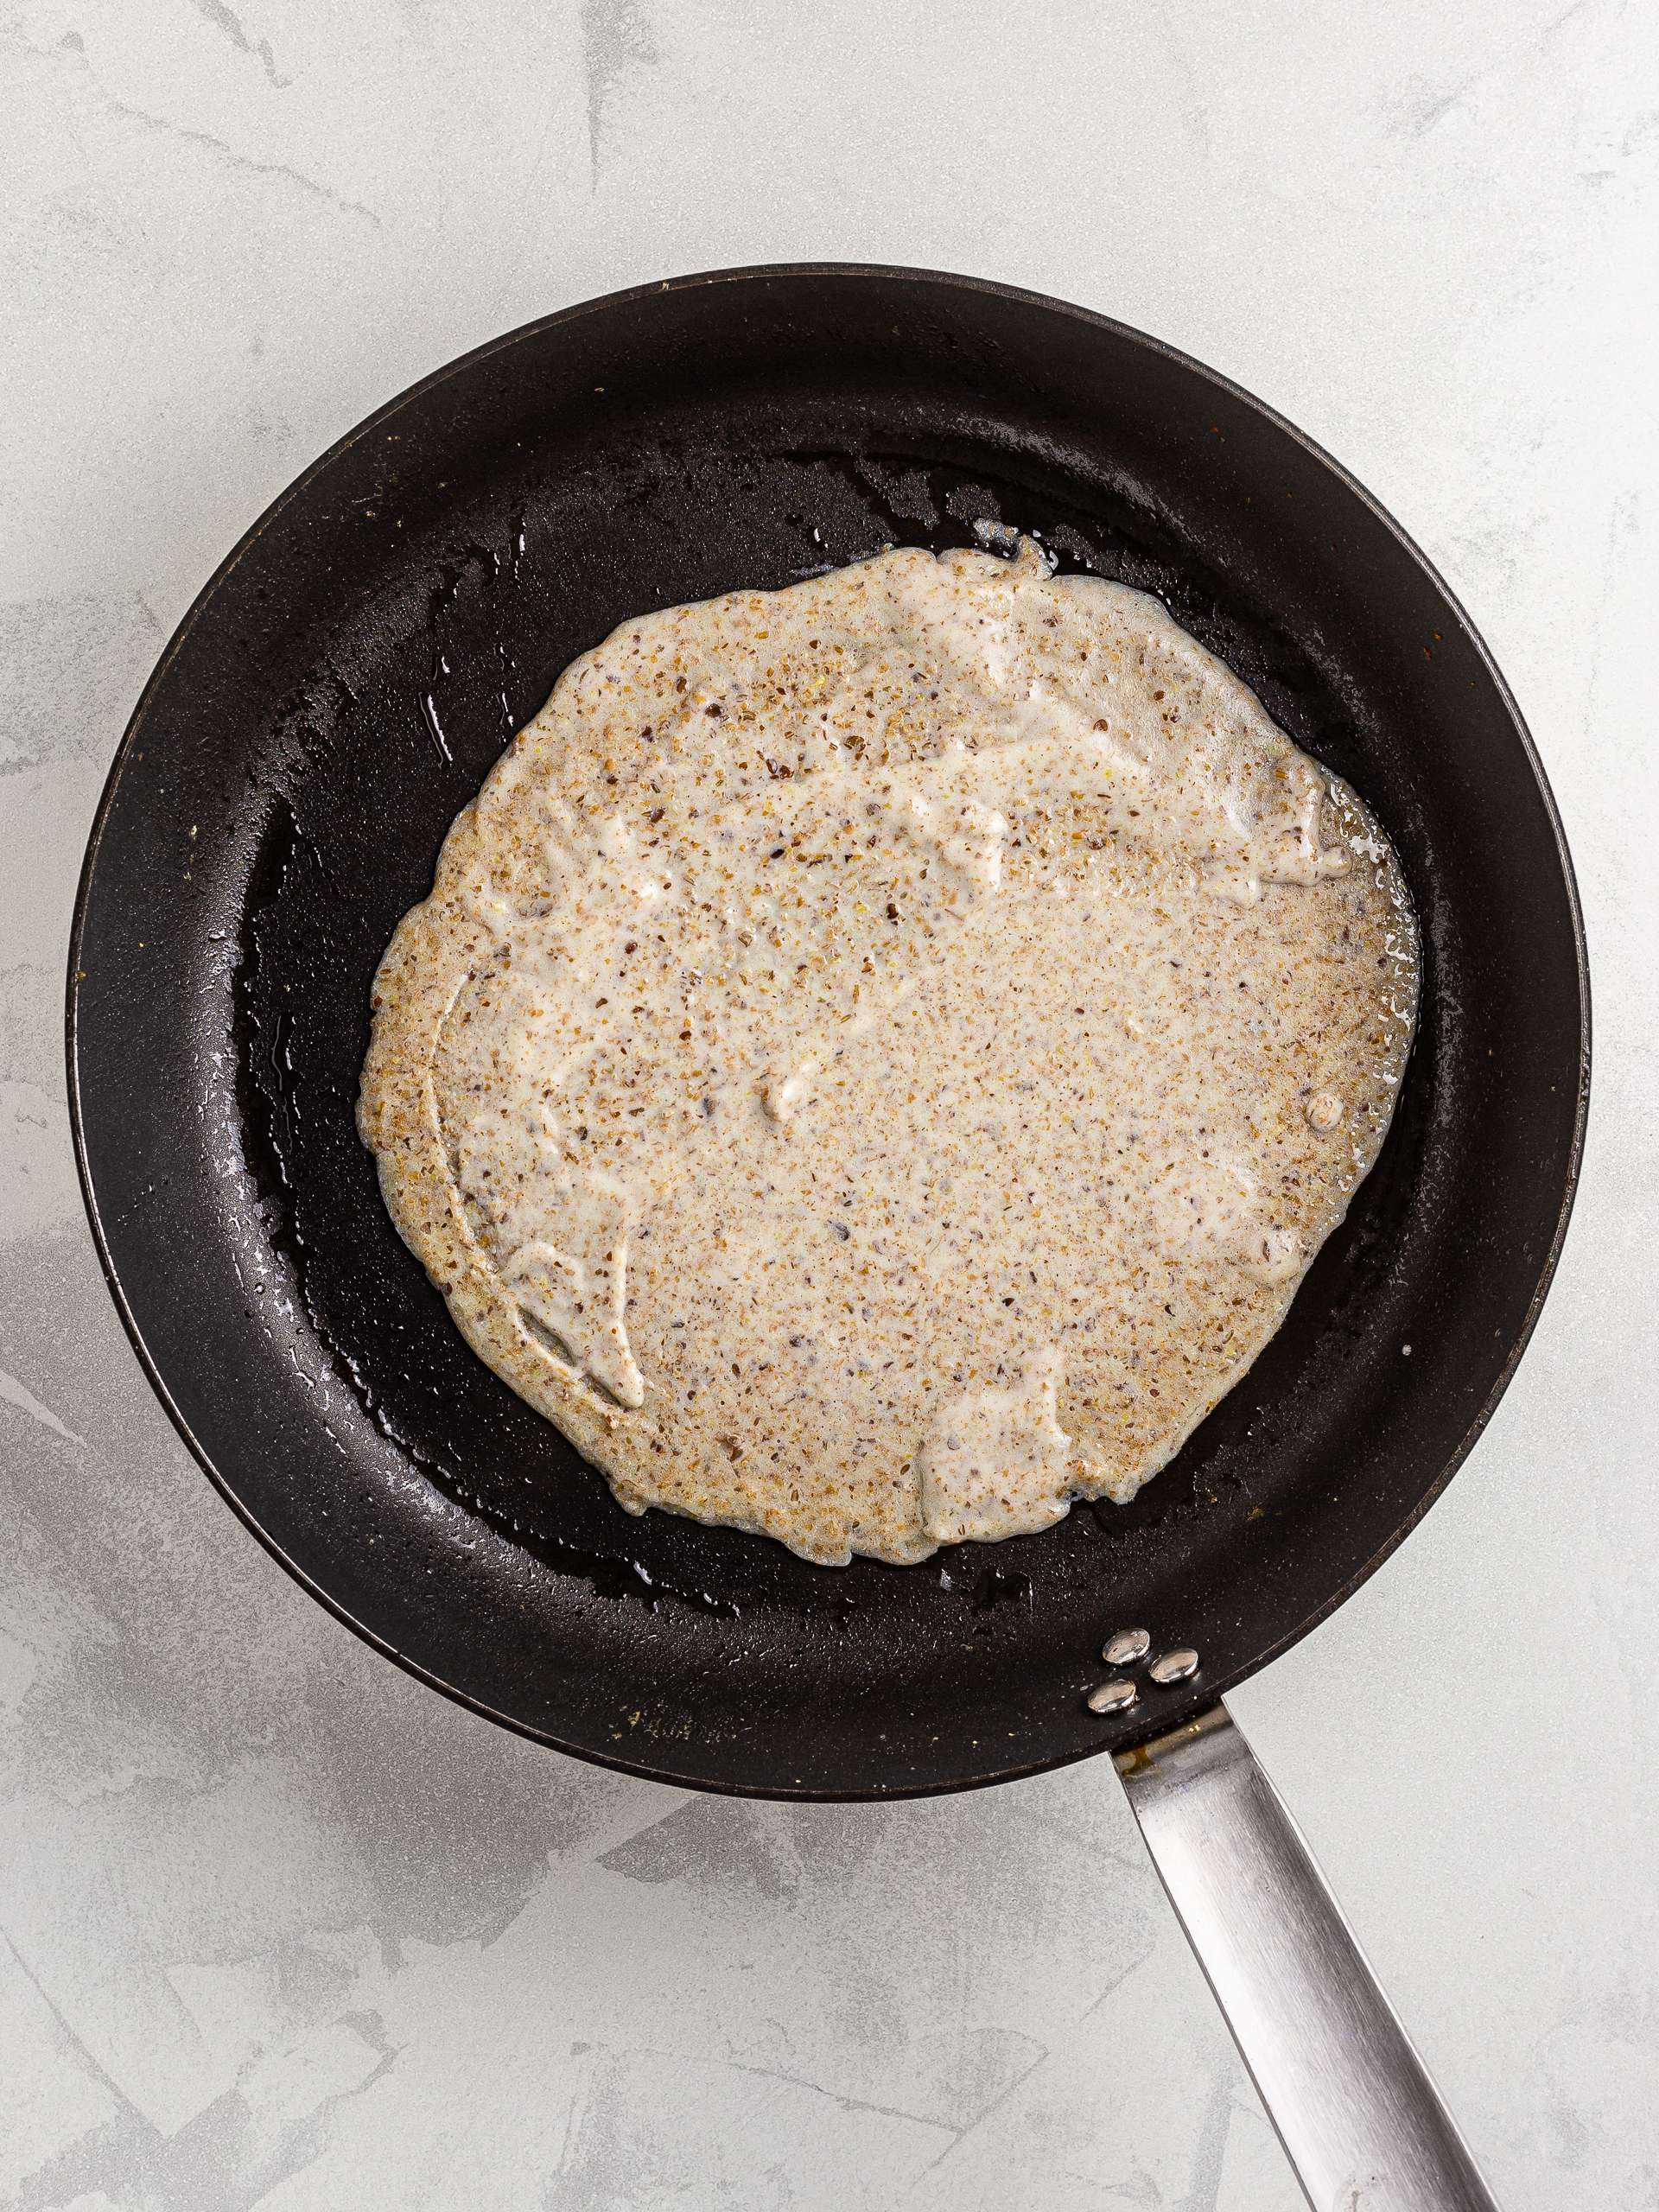 almond milk crepe in a skillet